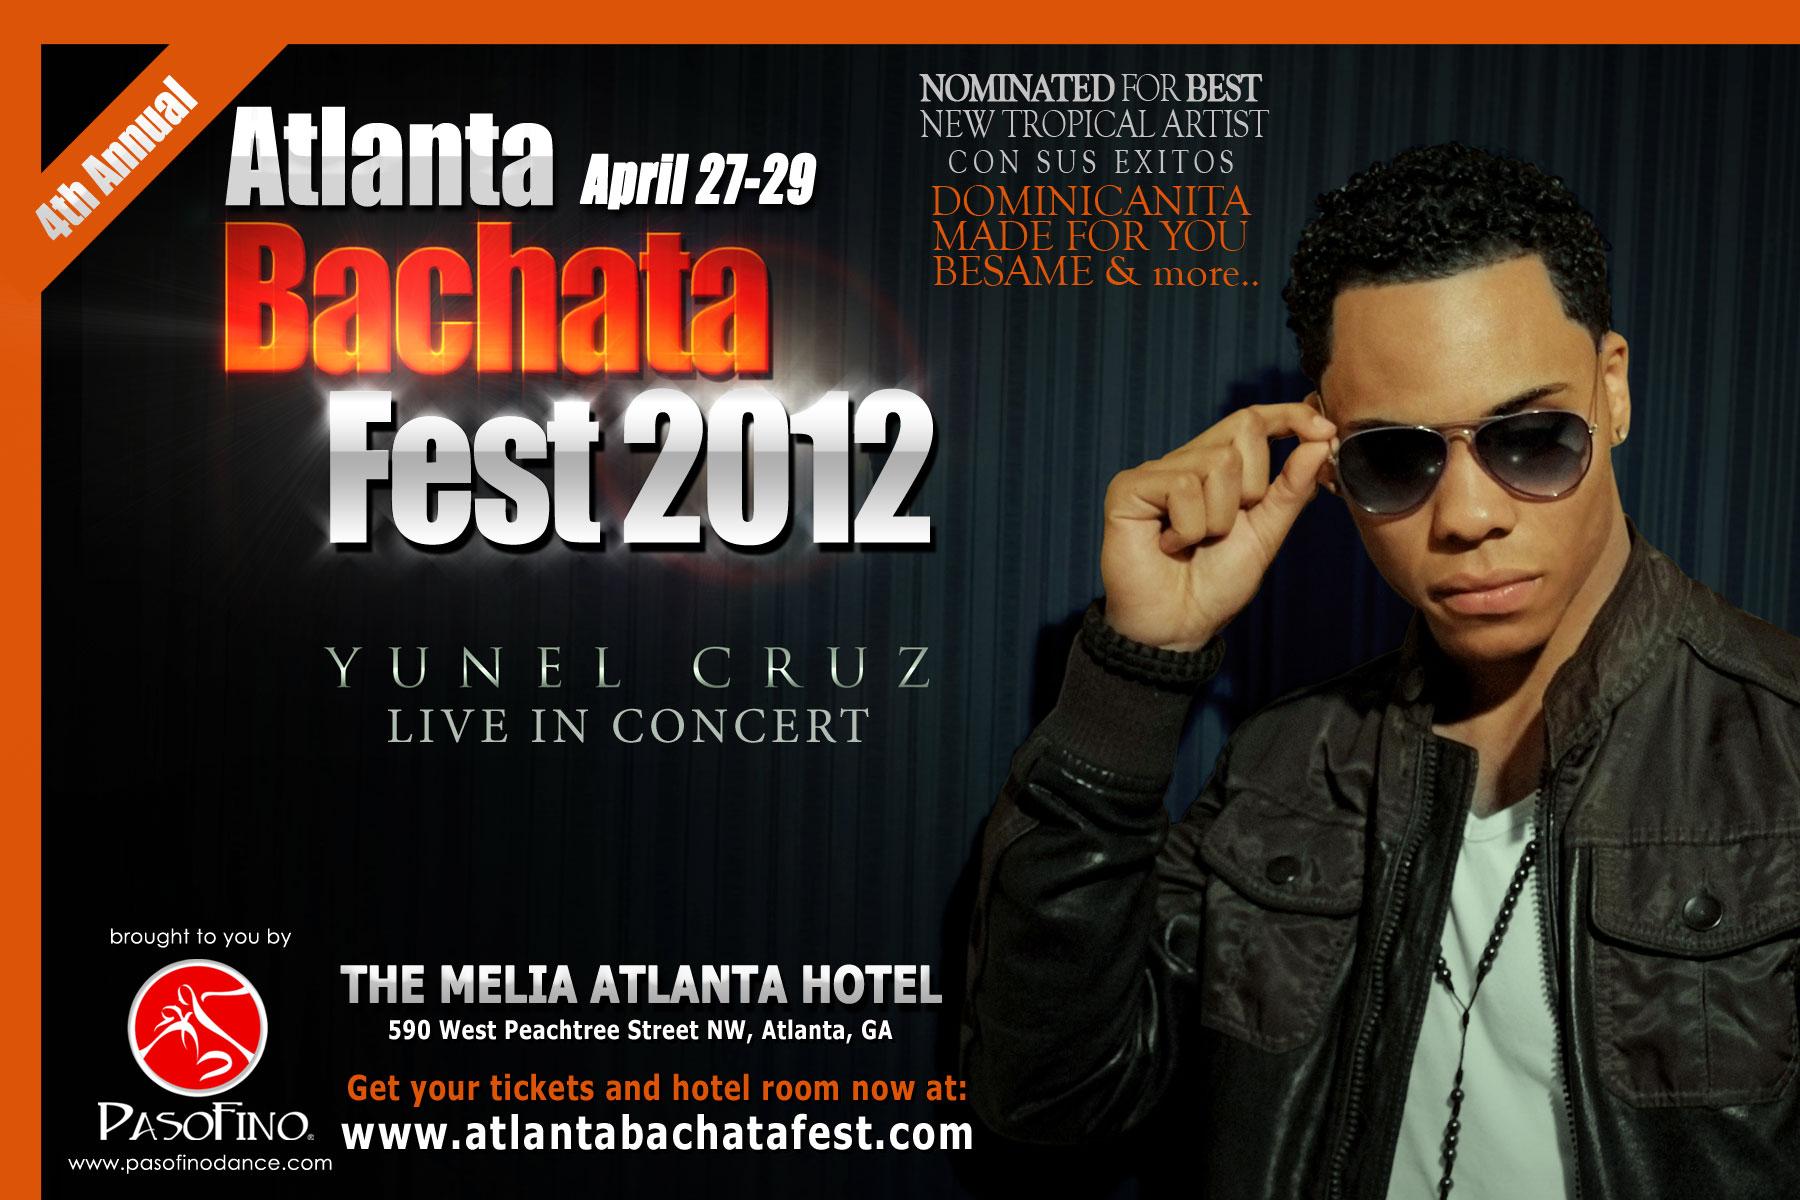 Yunel Cruz at the AtlantaBachataFest.com